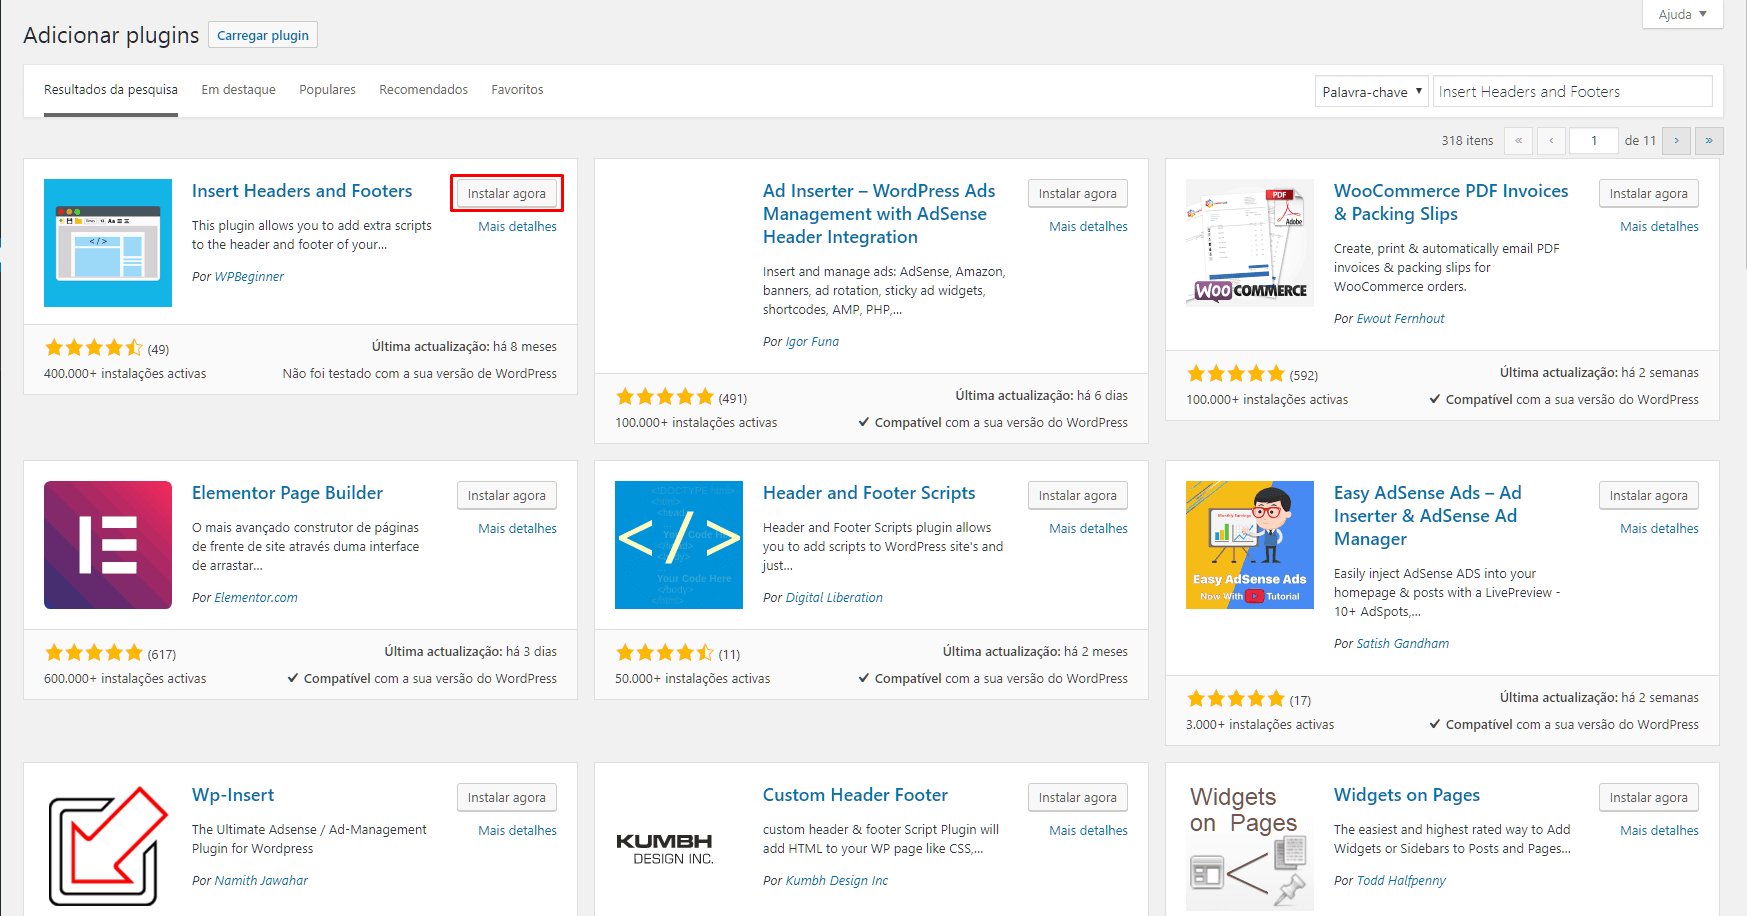 Resultado da busca de plugins no WordPress